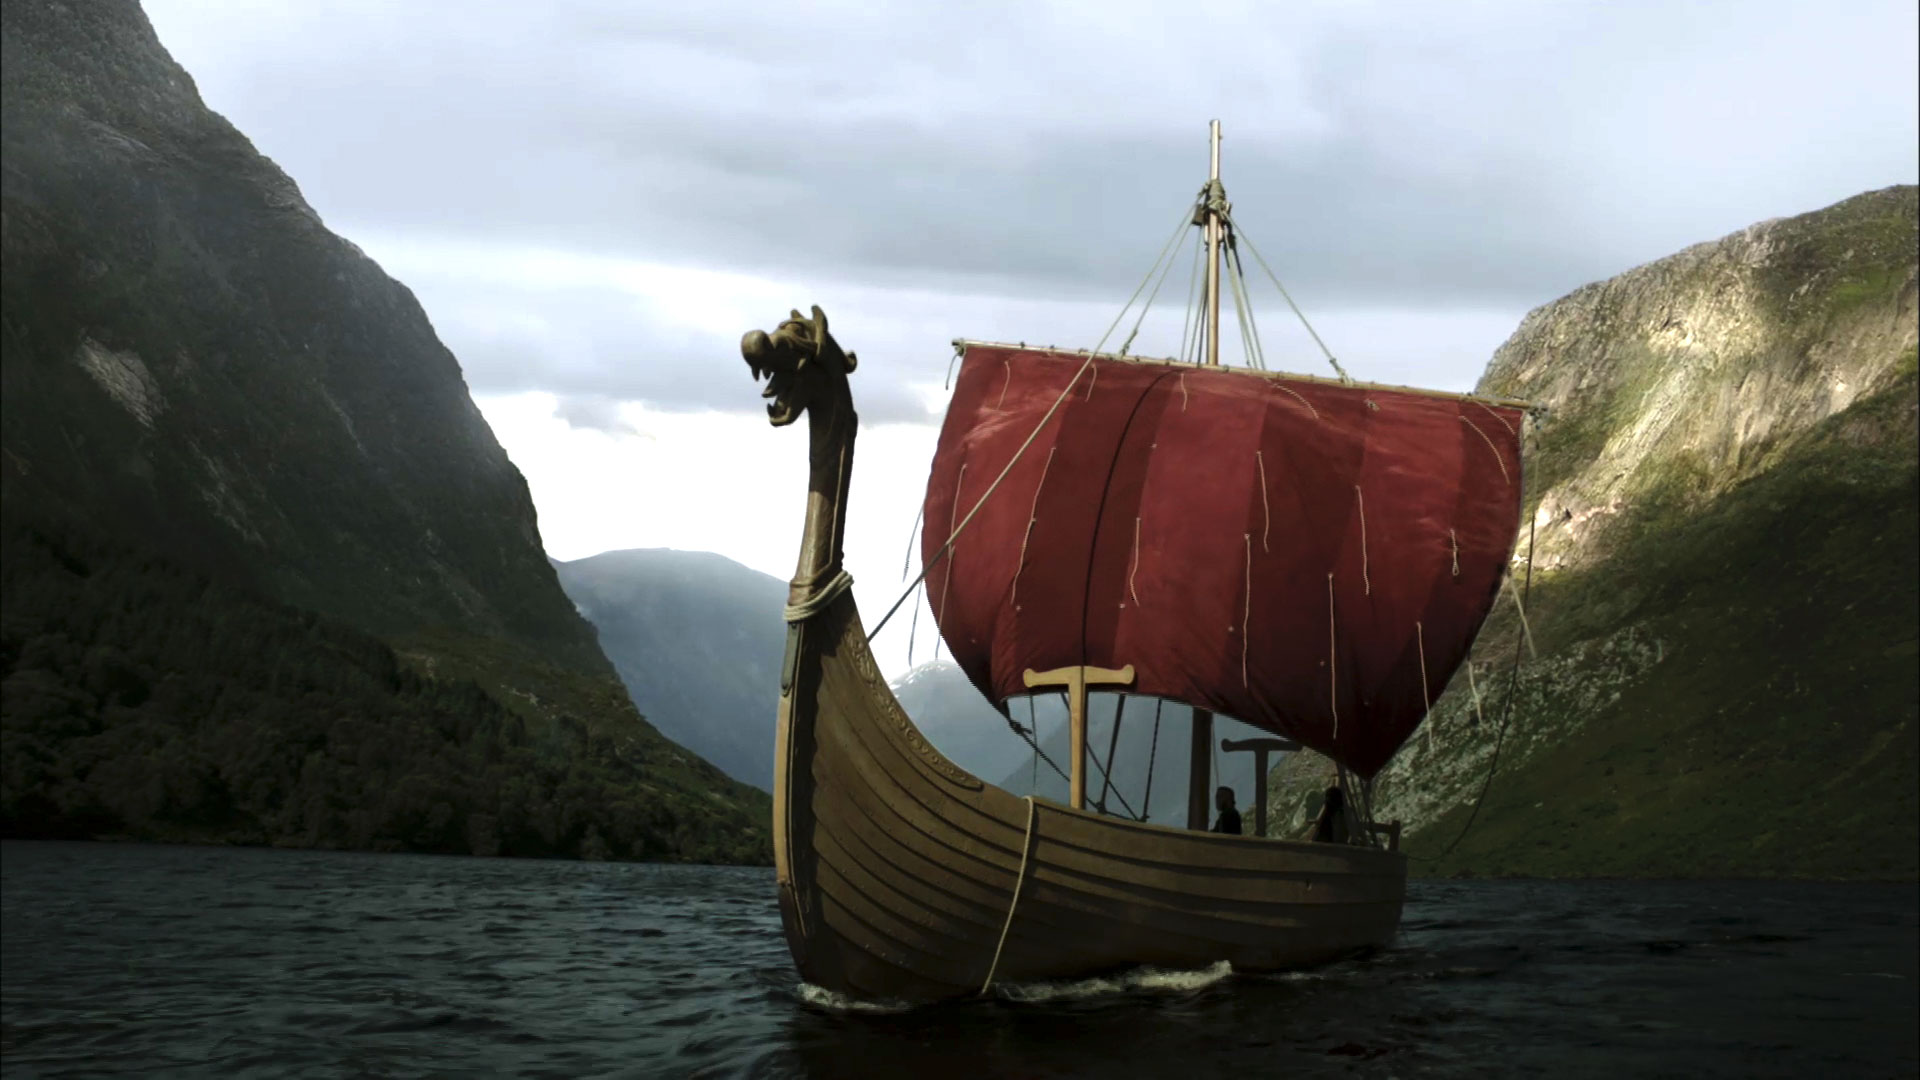 Watch Viking Ships Video - Vikings | HISTORY